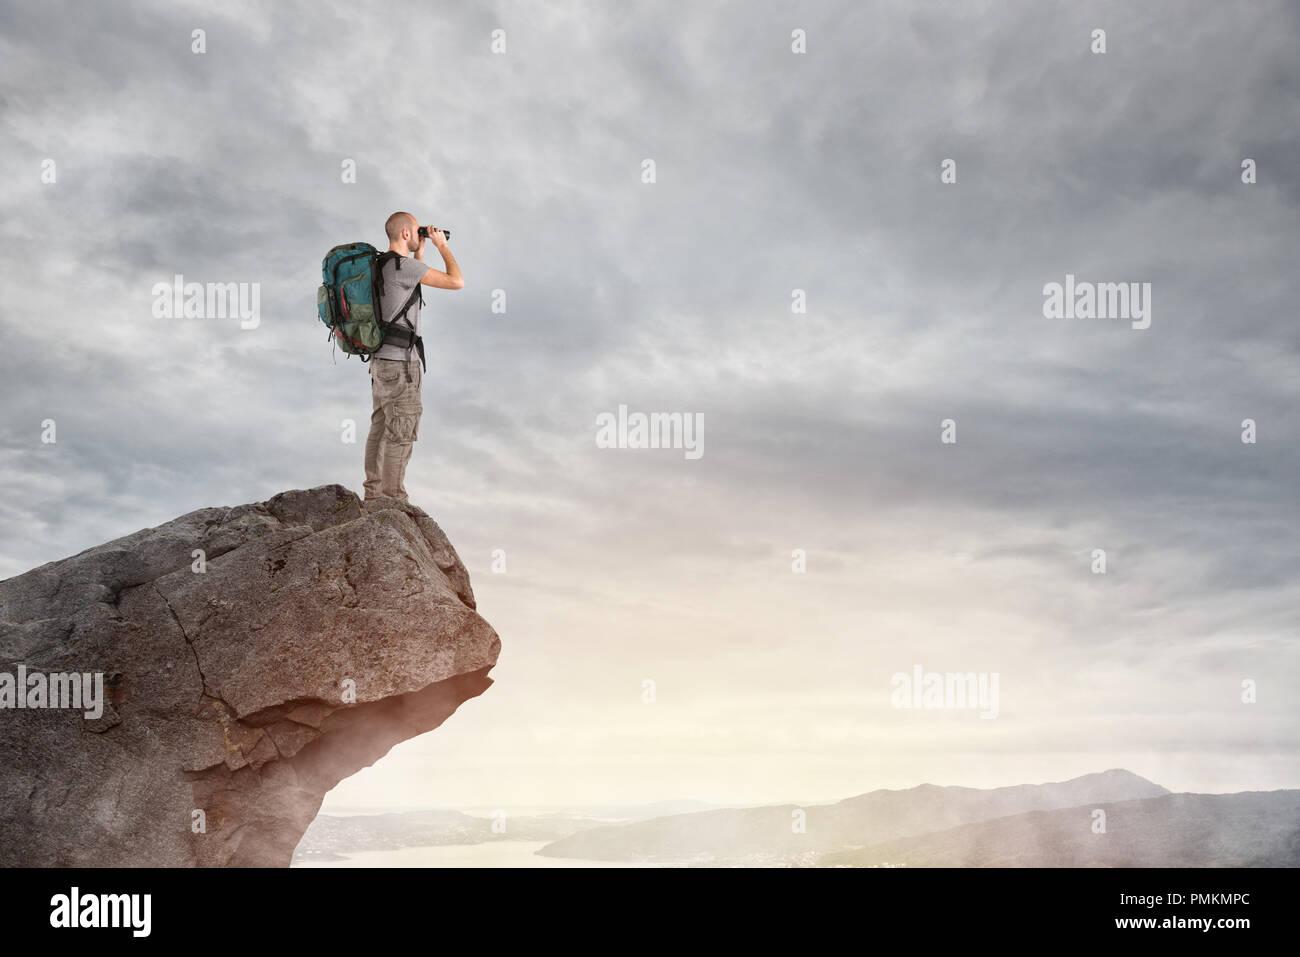 Explorer on the peak of a mountain - Stock Image